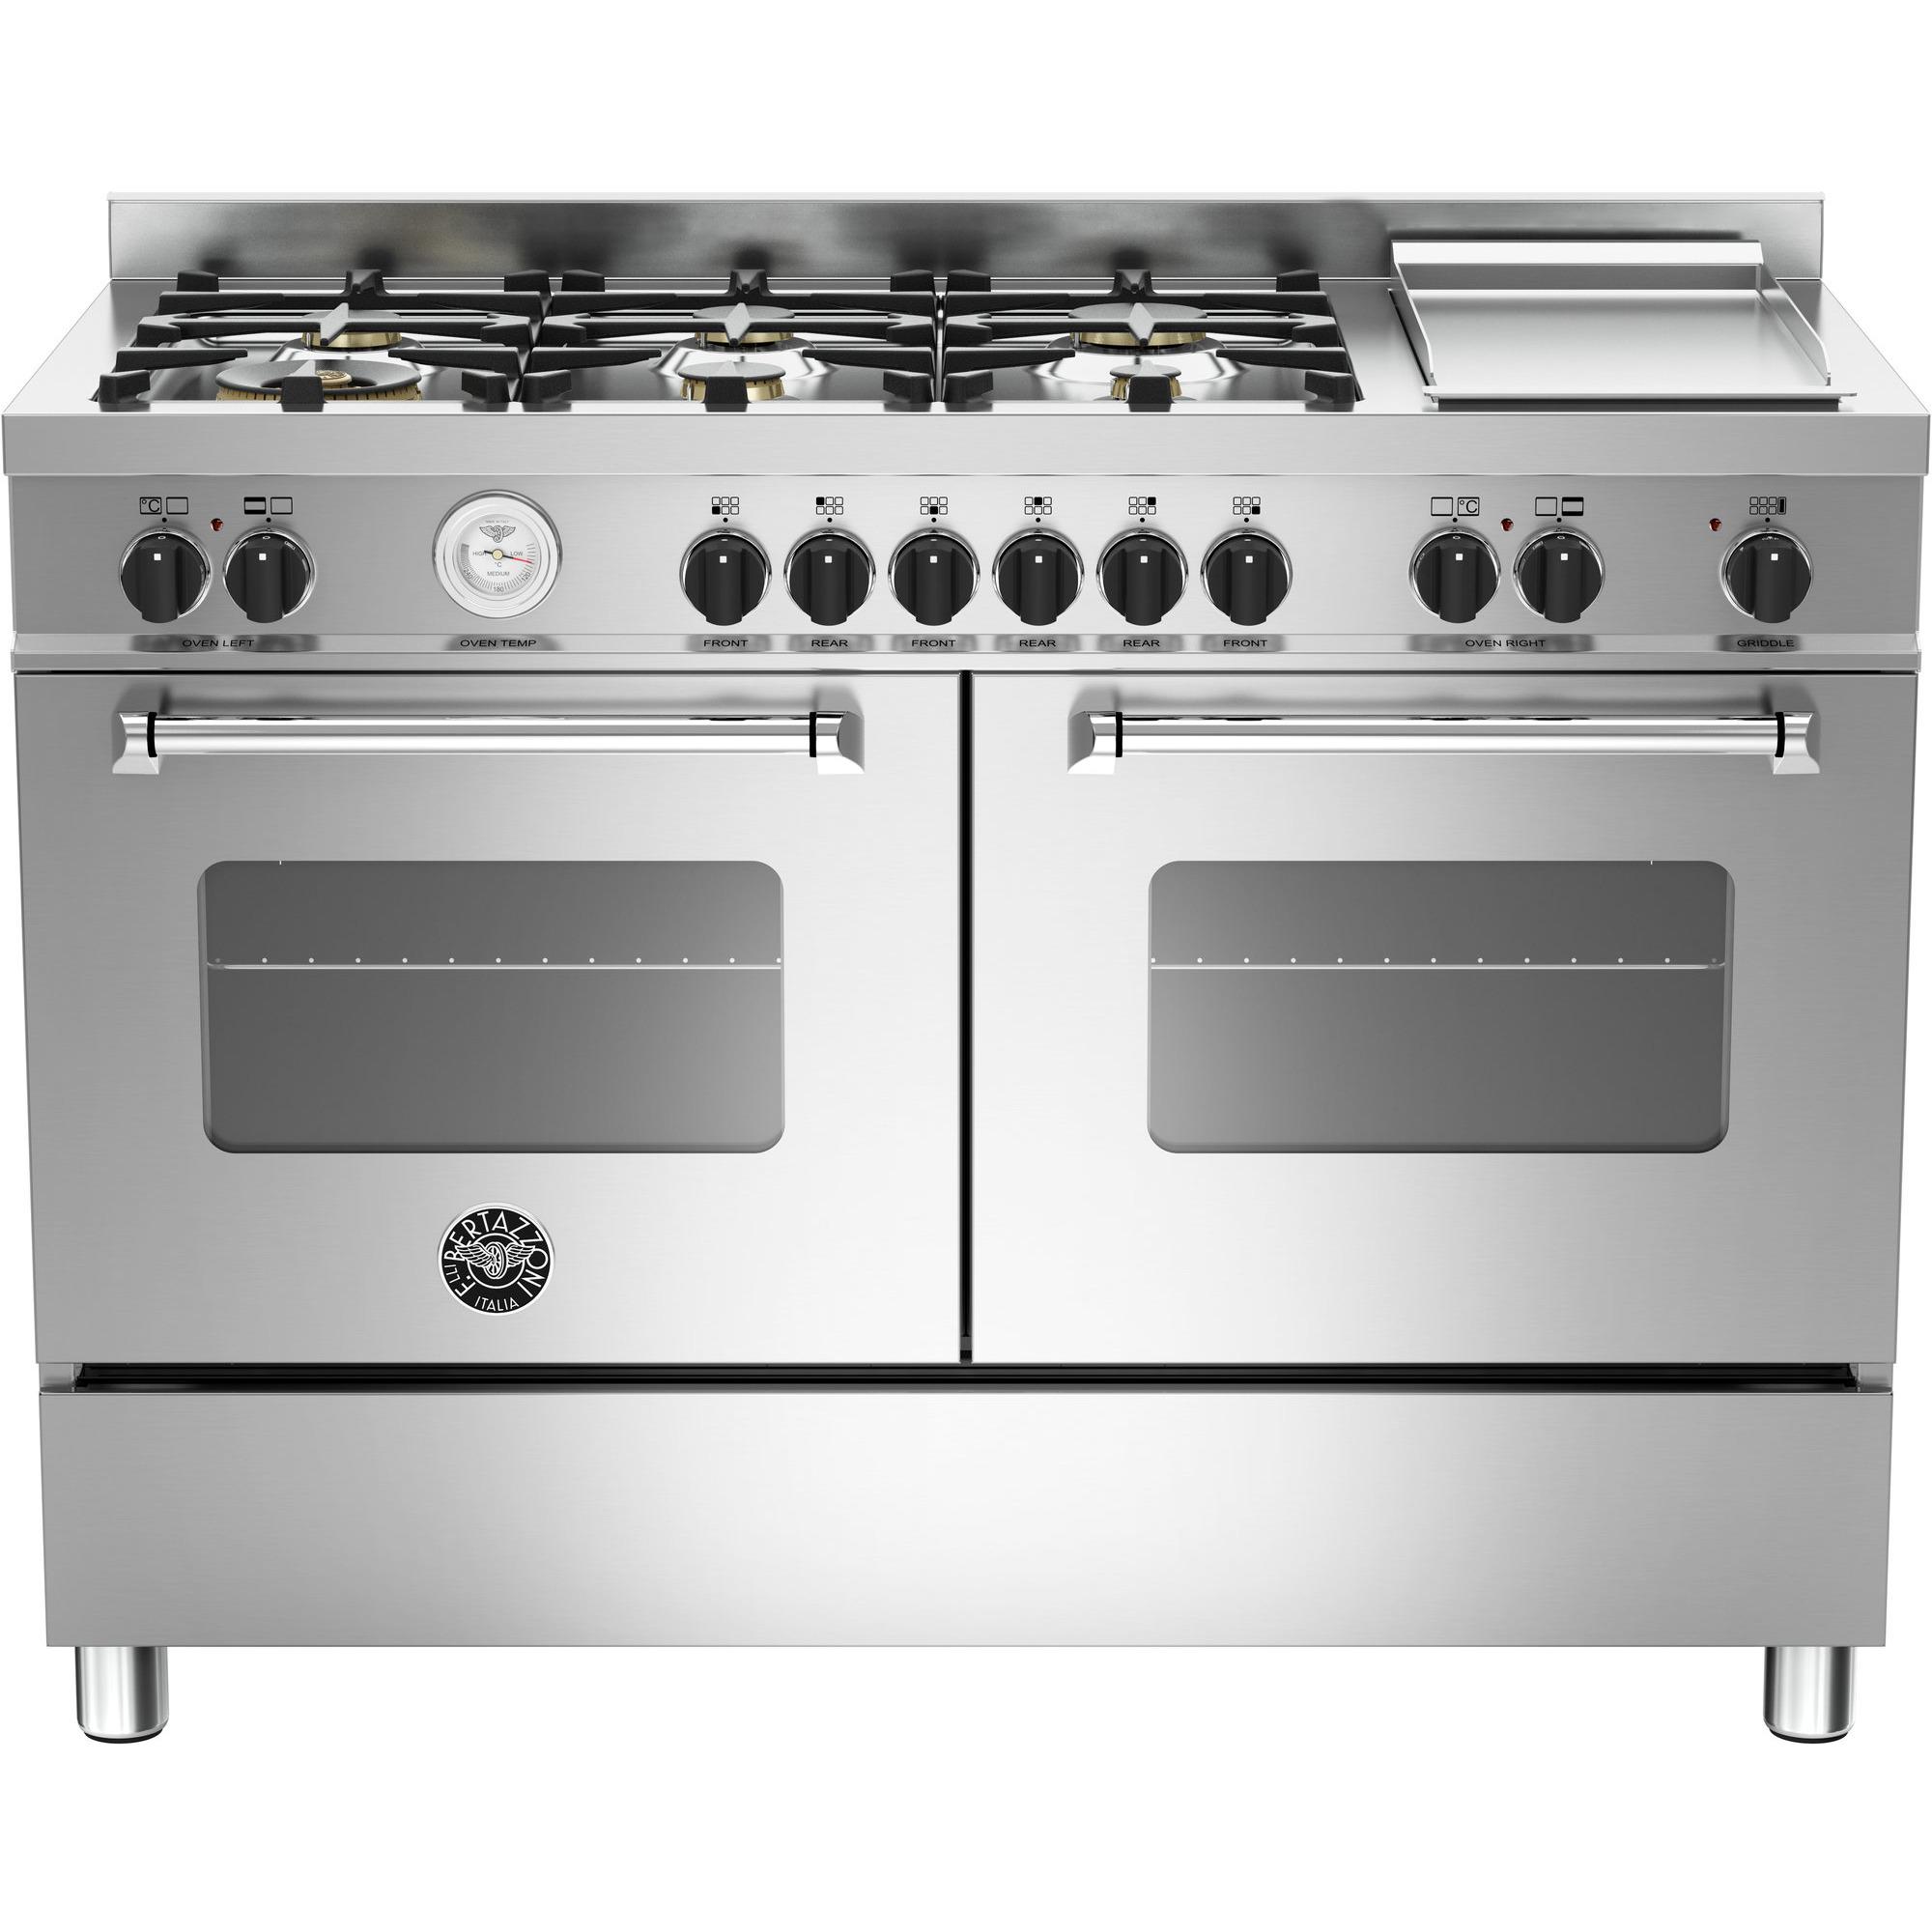 Bertazzoni MAS1206 Gasspis 120 cm 2 ugnar 6 brännare + elektrisk tepanyaki Rostfri